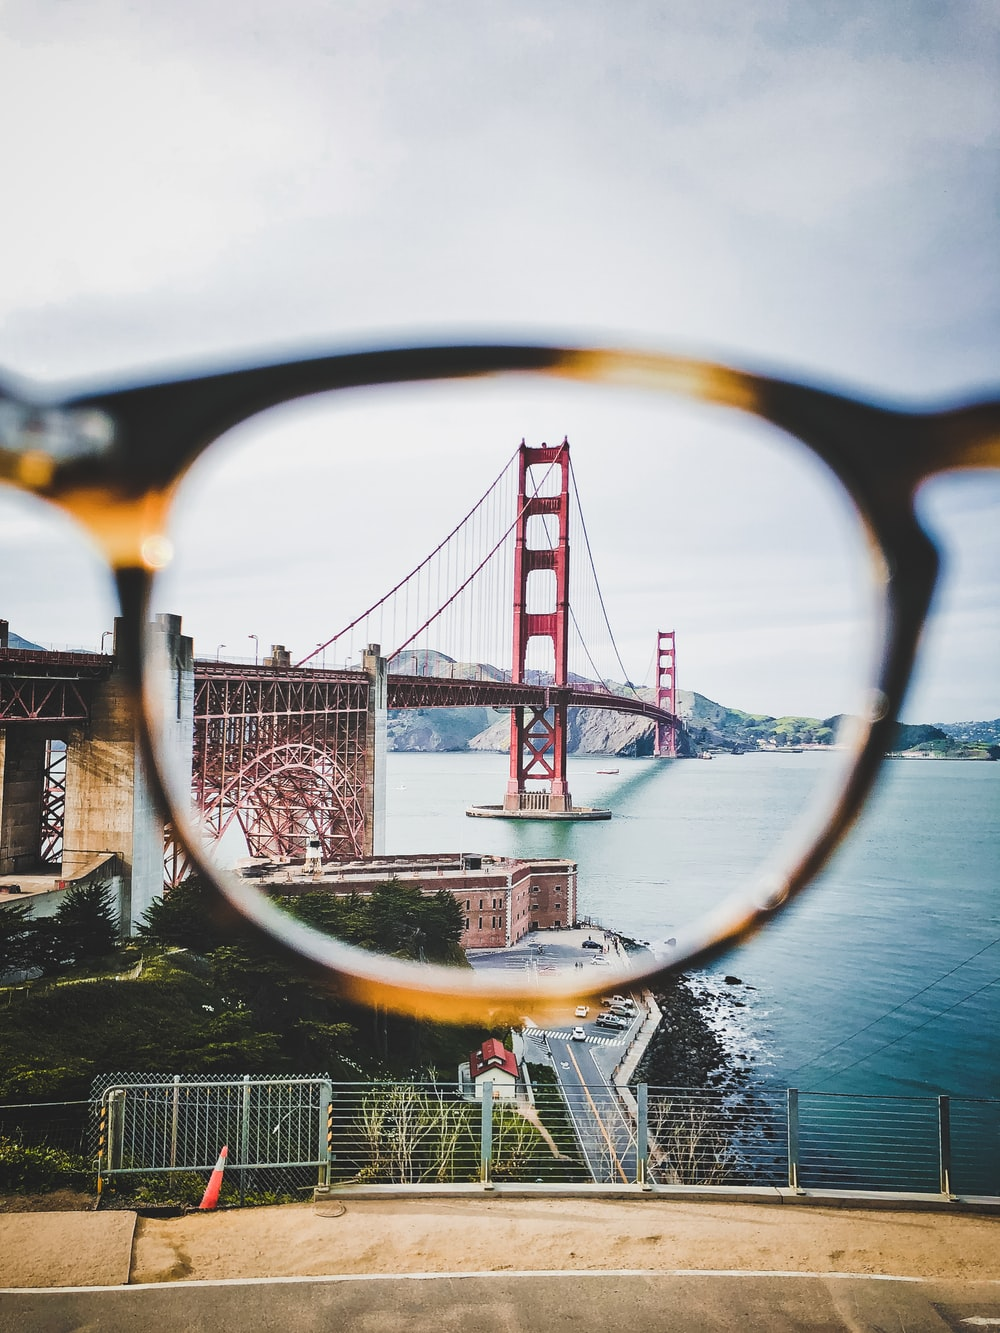 lens photography of Golden Gate Bridge, San Francisco California during daytime